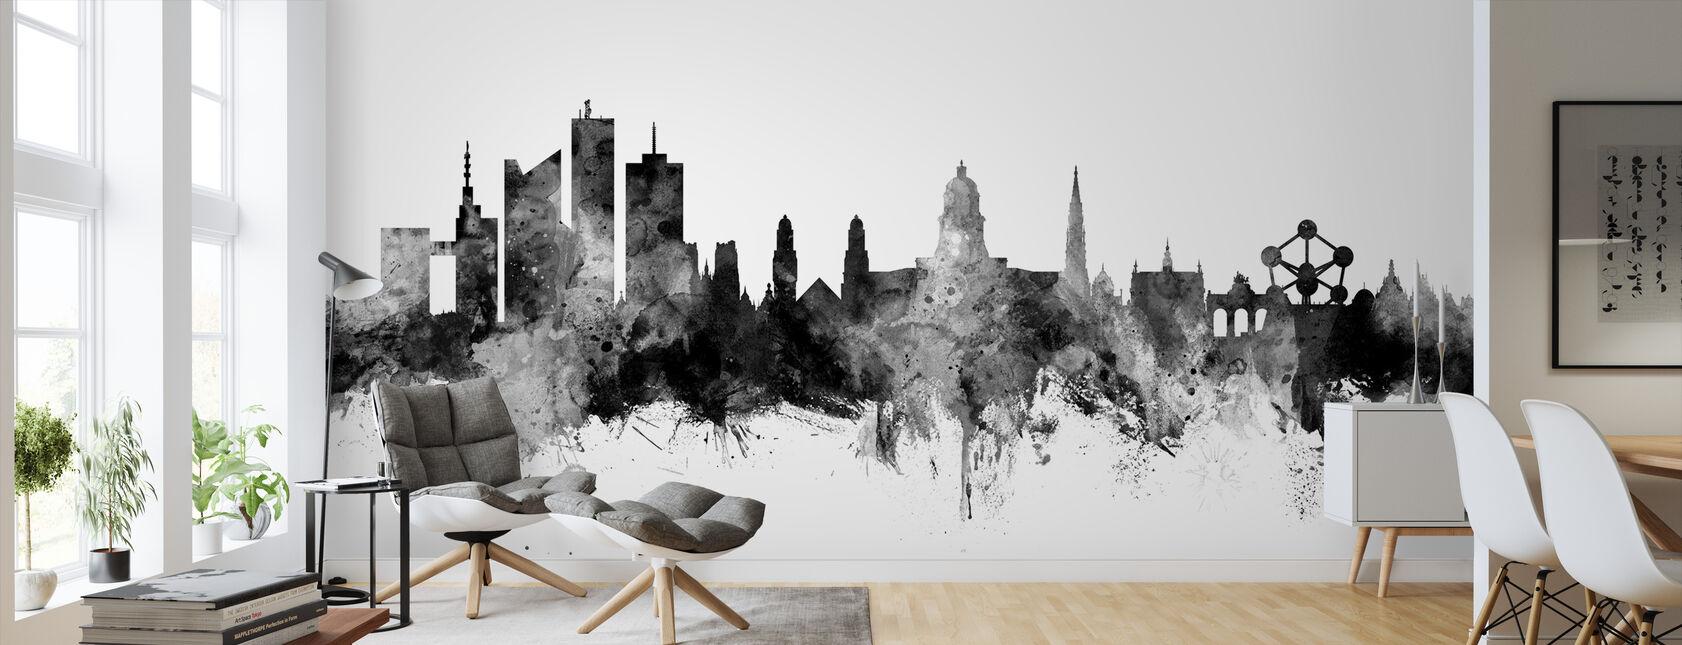 Brussels Skyline Black - Wallpaper - Living Room